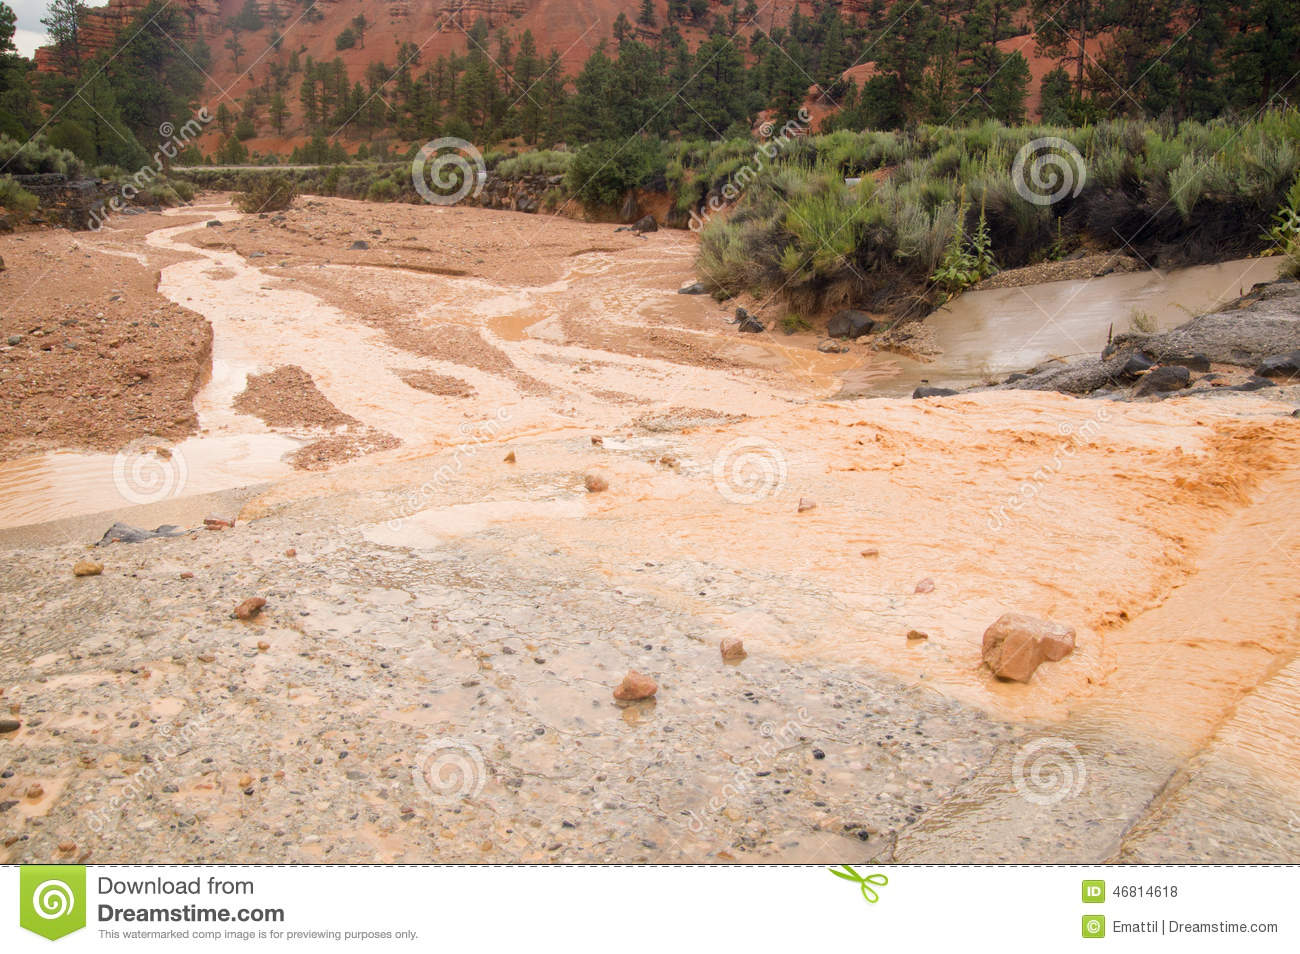 Muddy Water From Flash Flood In Utah Desert Stock Photo.